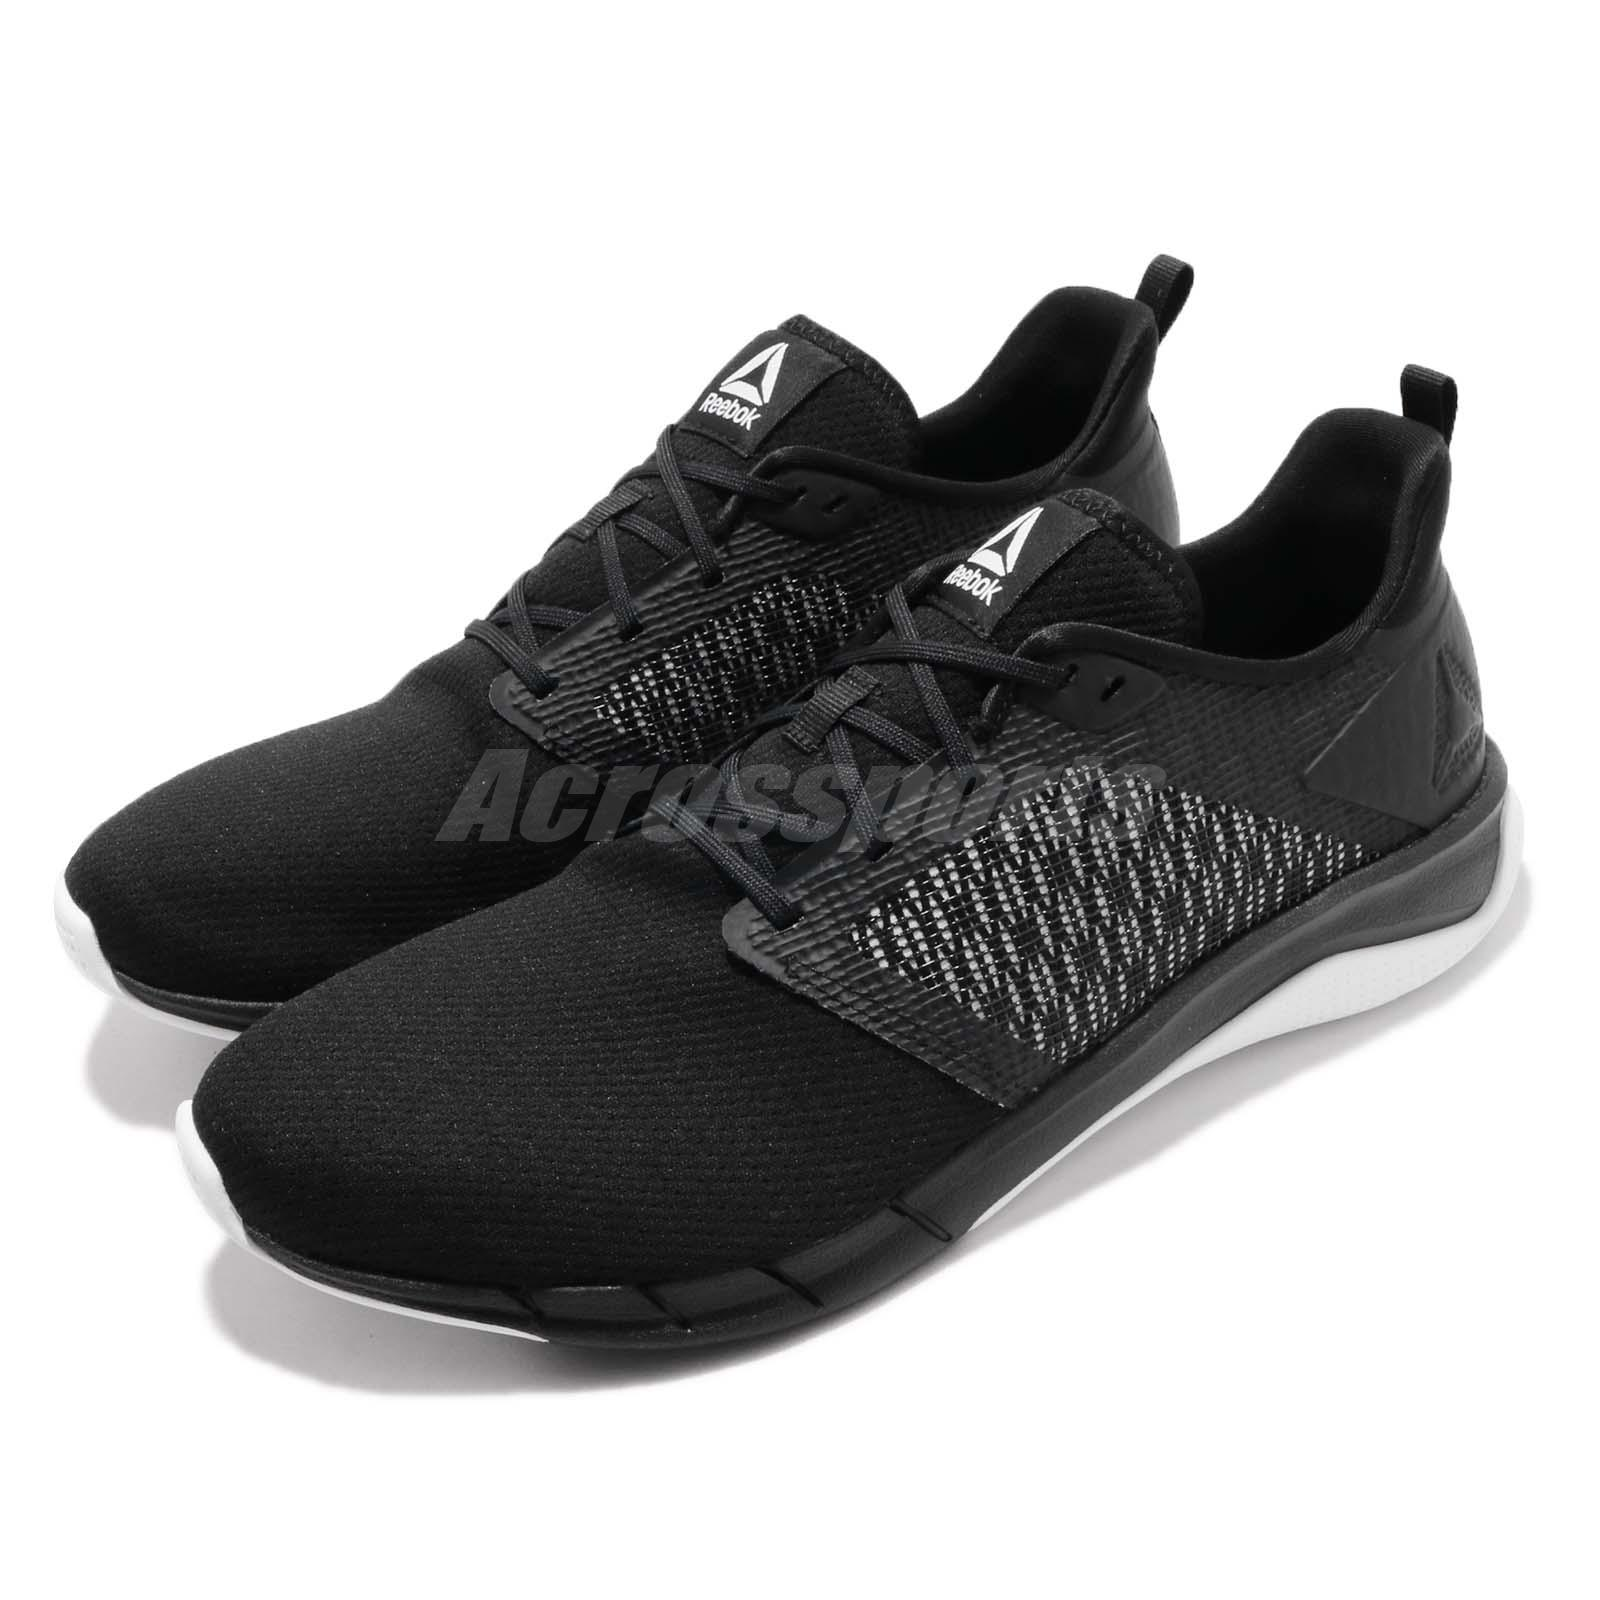 019fefc8f7 Details about Reebok Print Run 3.0 Black White Men Running Training Shoes  Sneakers CN4656